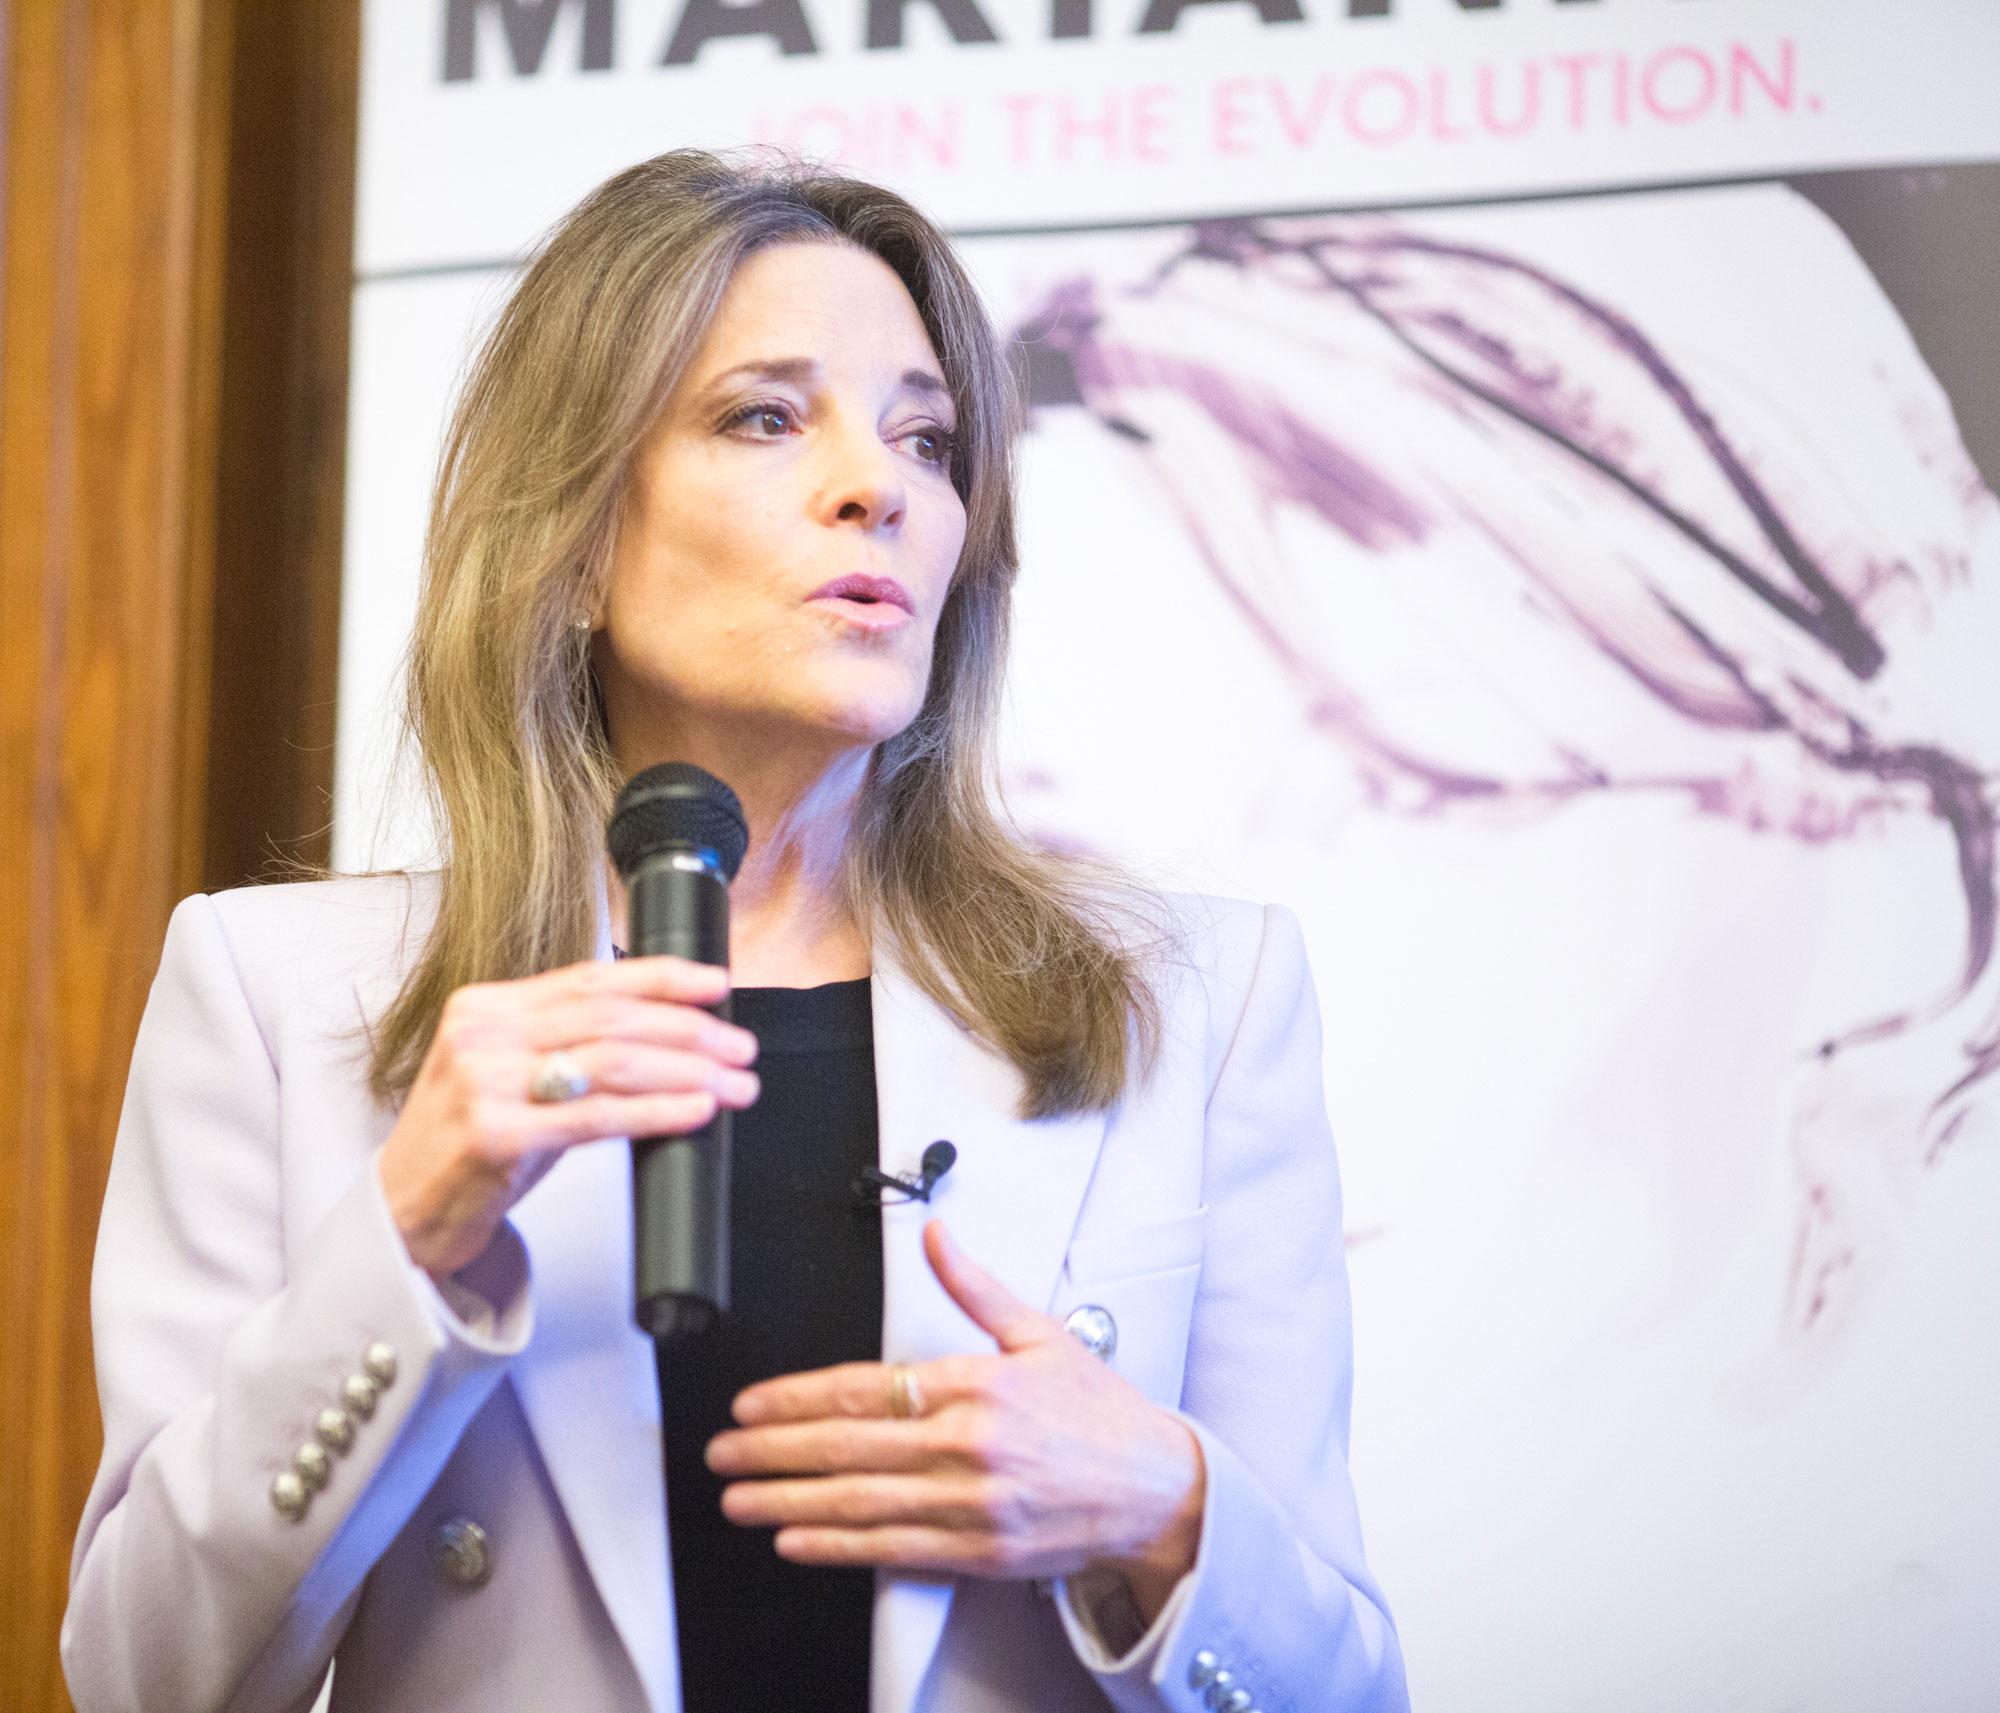 Immigration Reform News: Marianne Williamson Immigration Proposal: A Civilized Path